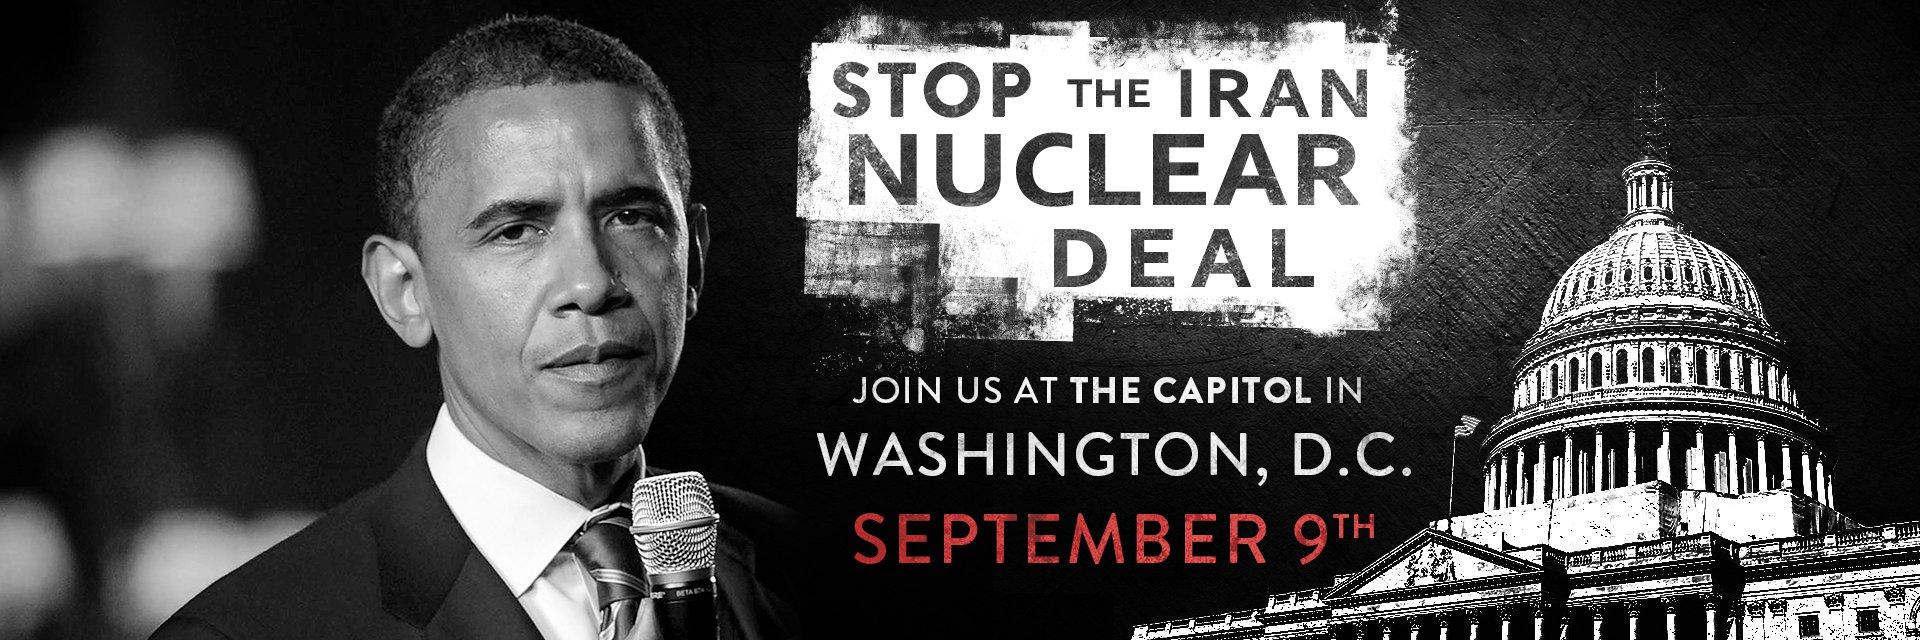 Iran-Nuclear-deal-9-September